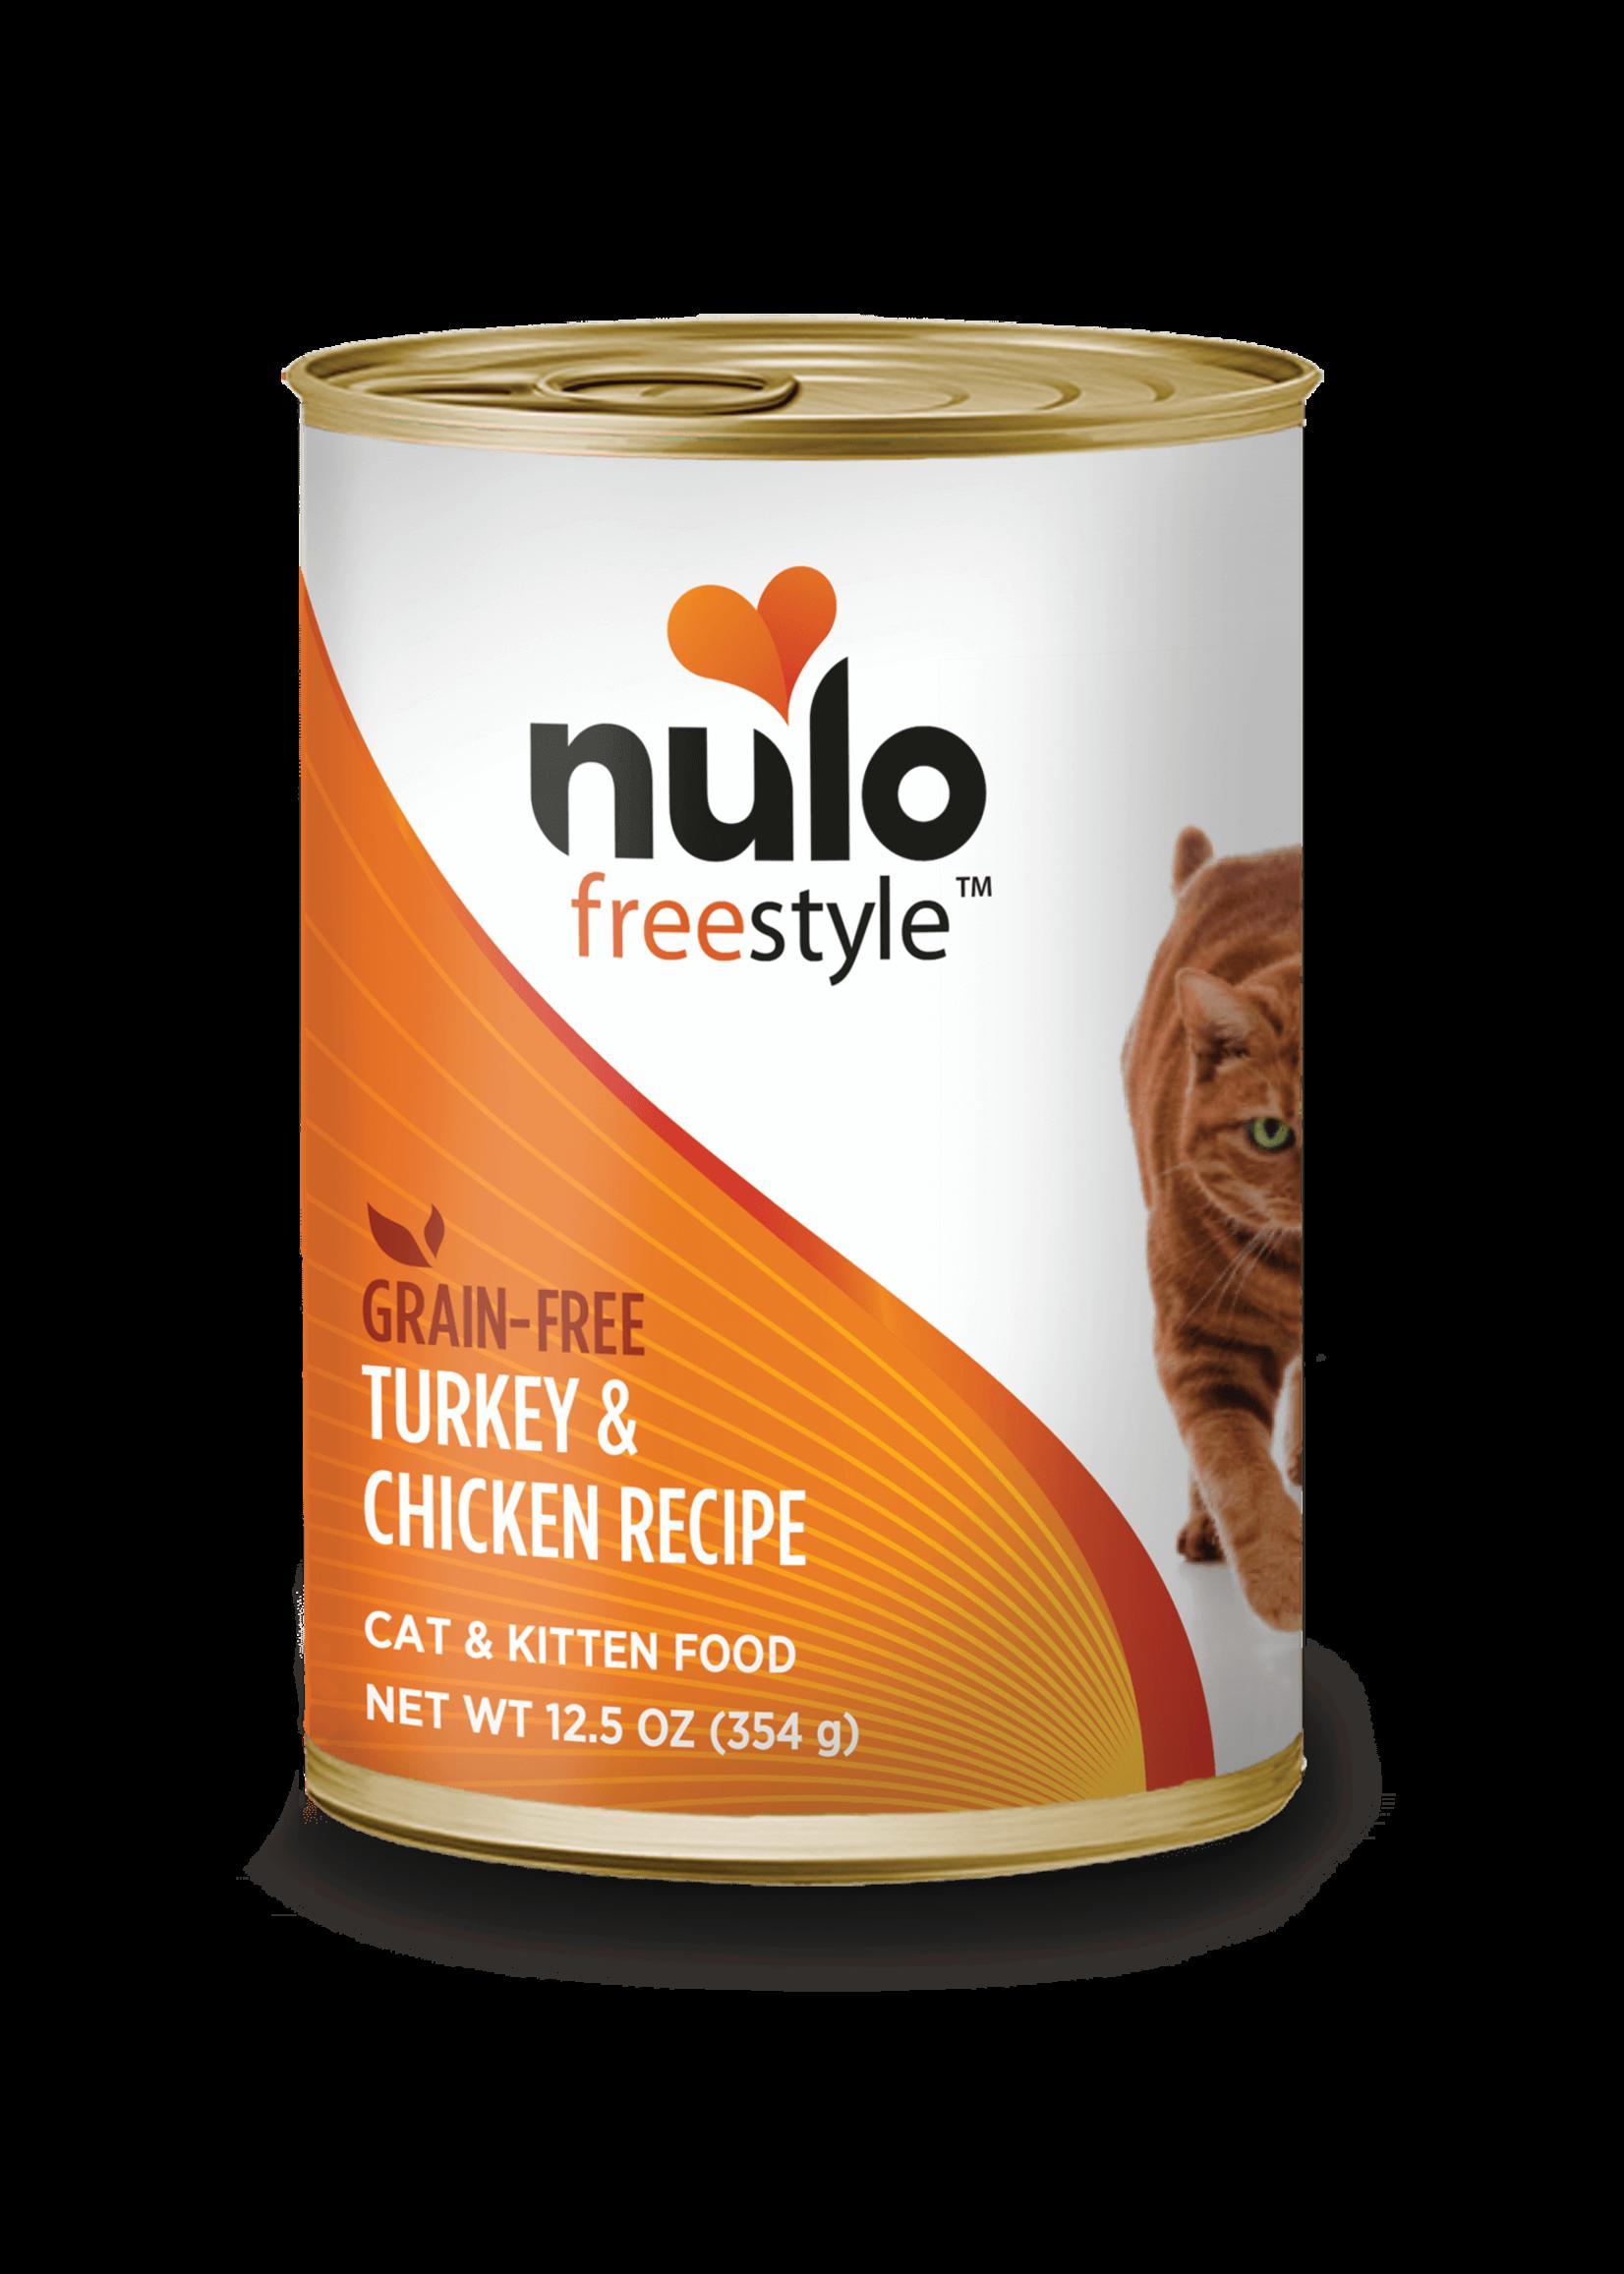 Nulo Nulo FreeStyle Grain Free Cat Food Turkey & Chicken, 12.5oz Can